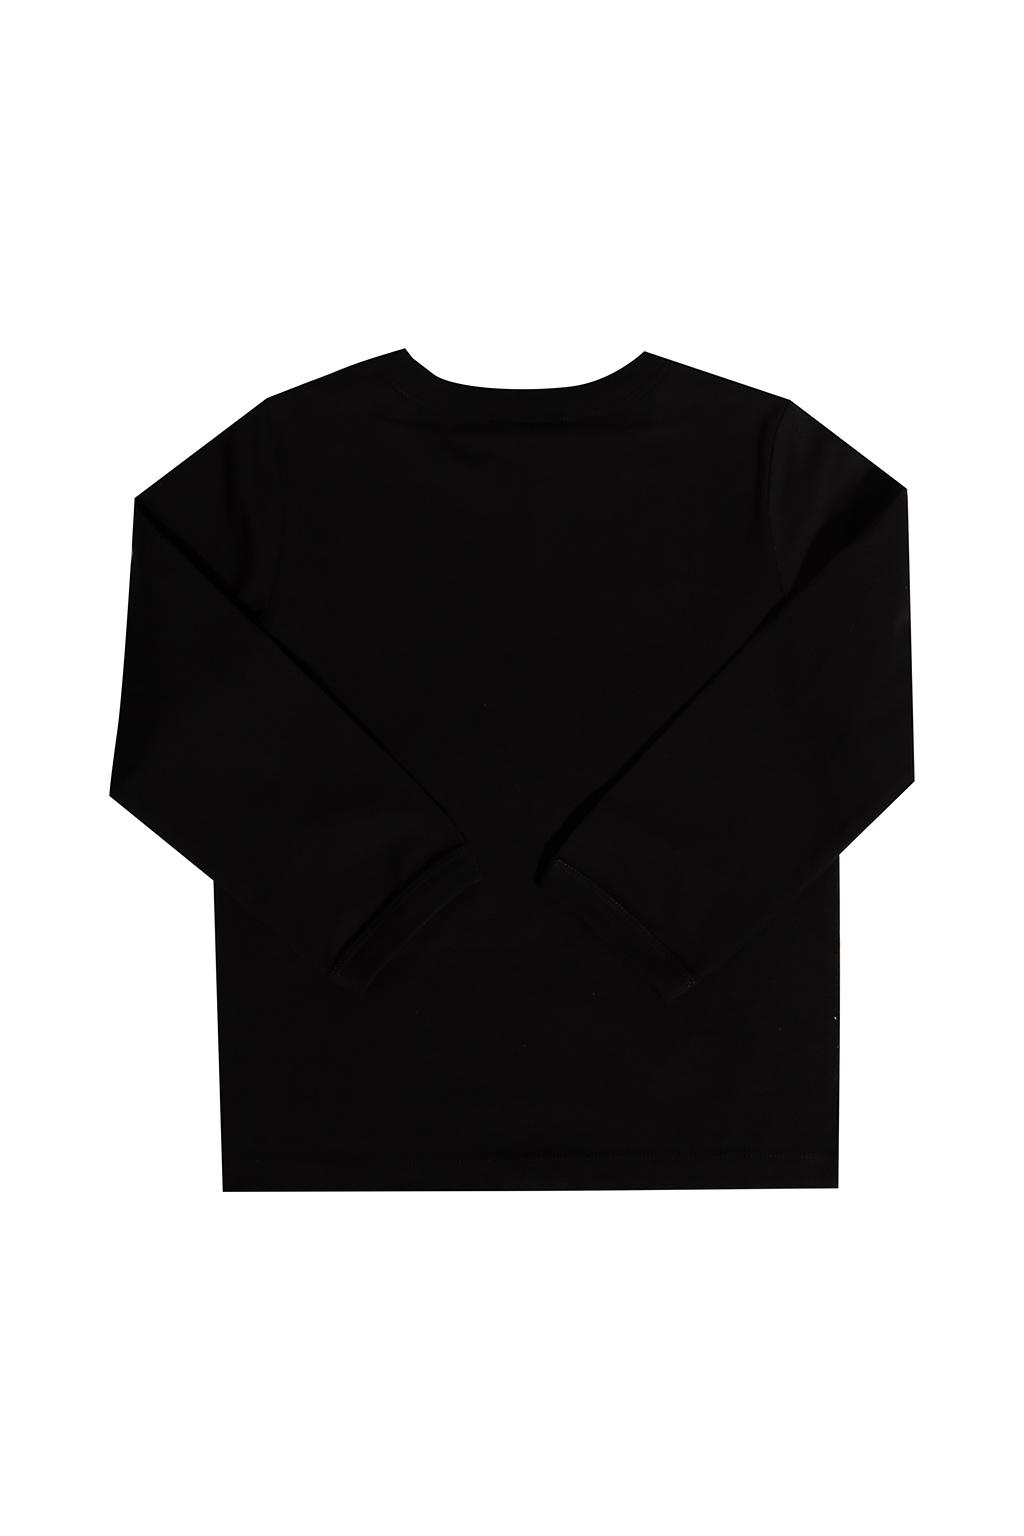 Stella McCartney Kids Long-sleeved T-shirt